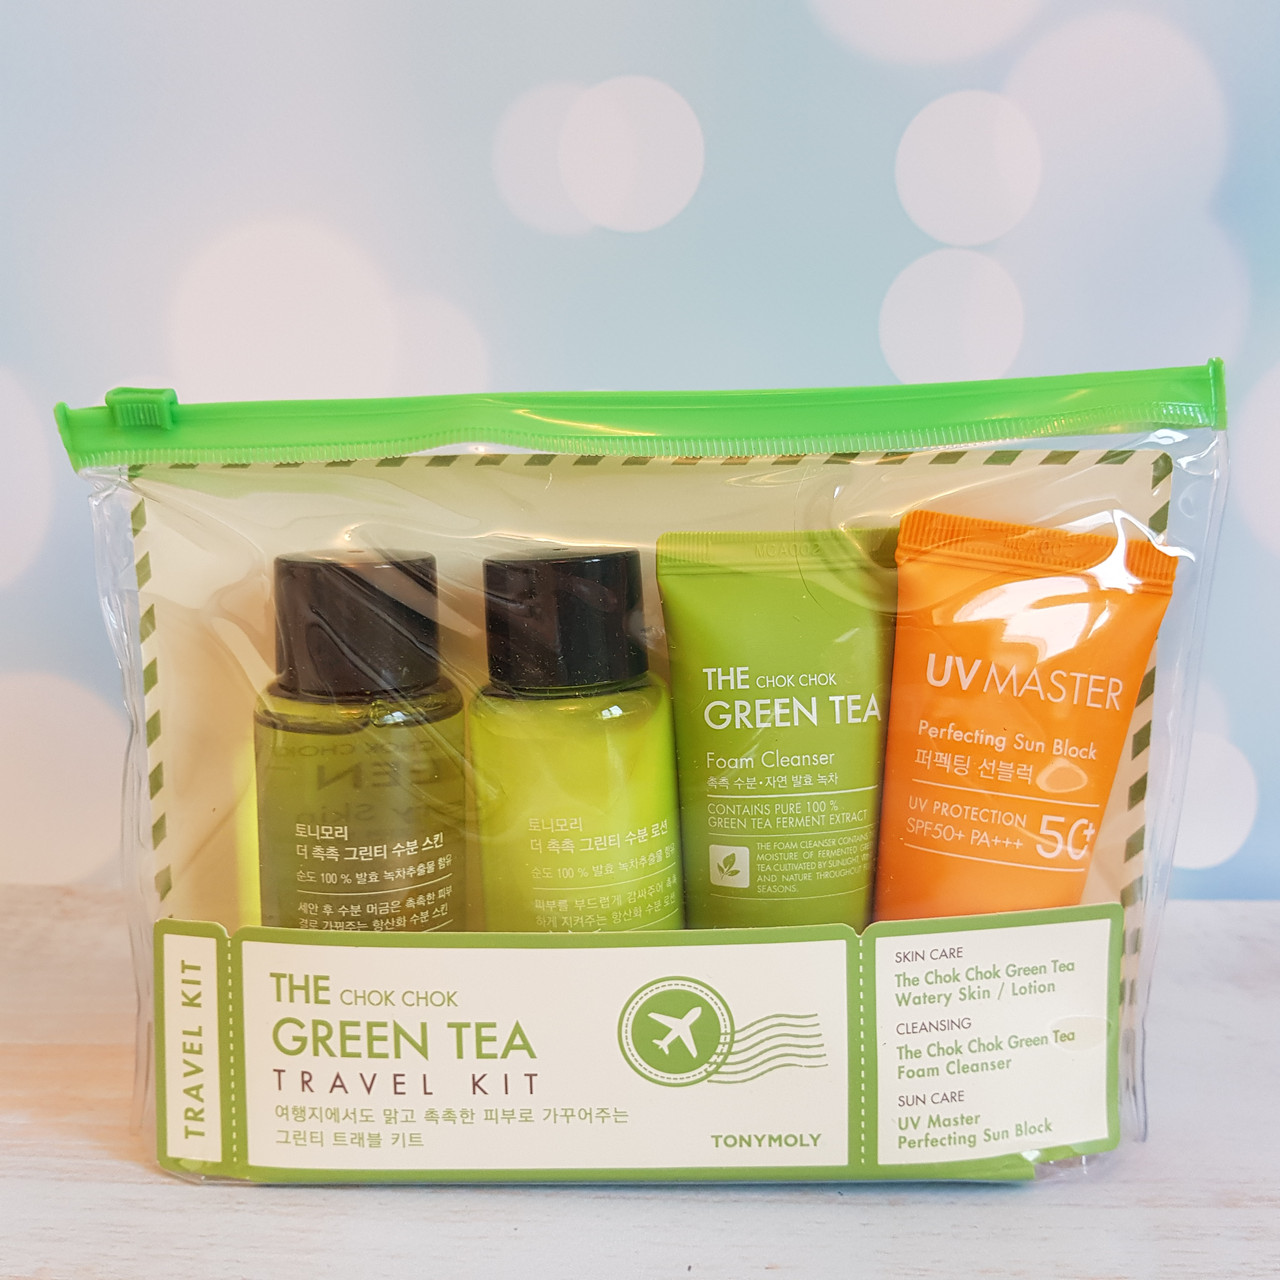 Дорожный набор TONYMOLY The Chok Chok Green Tea Travel Kit